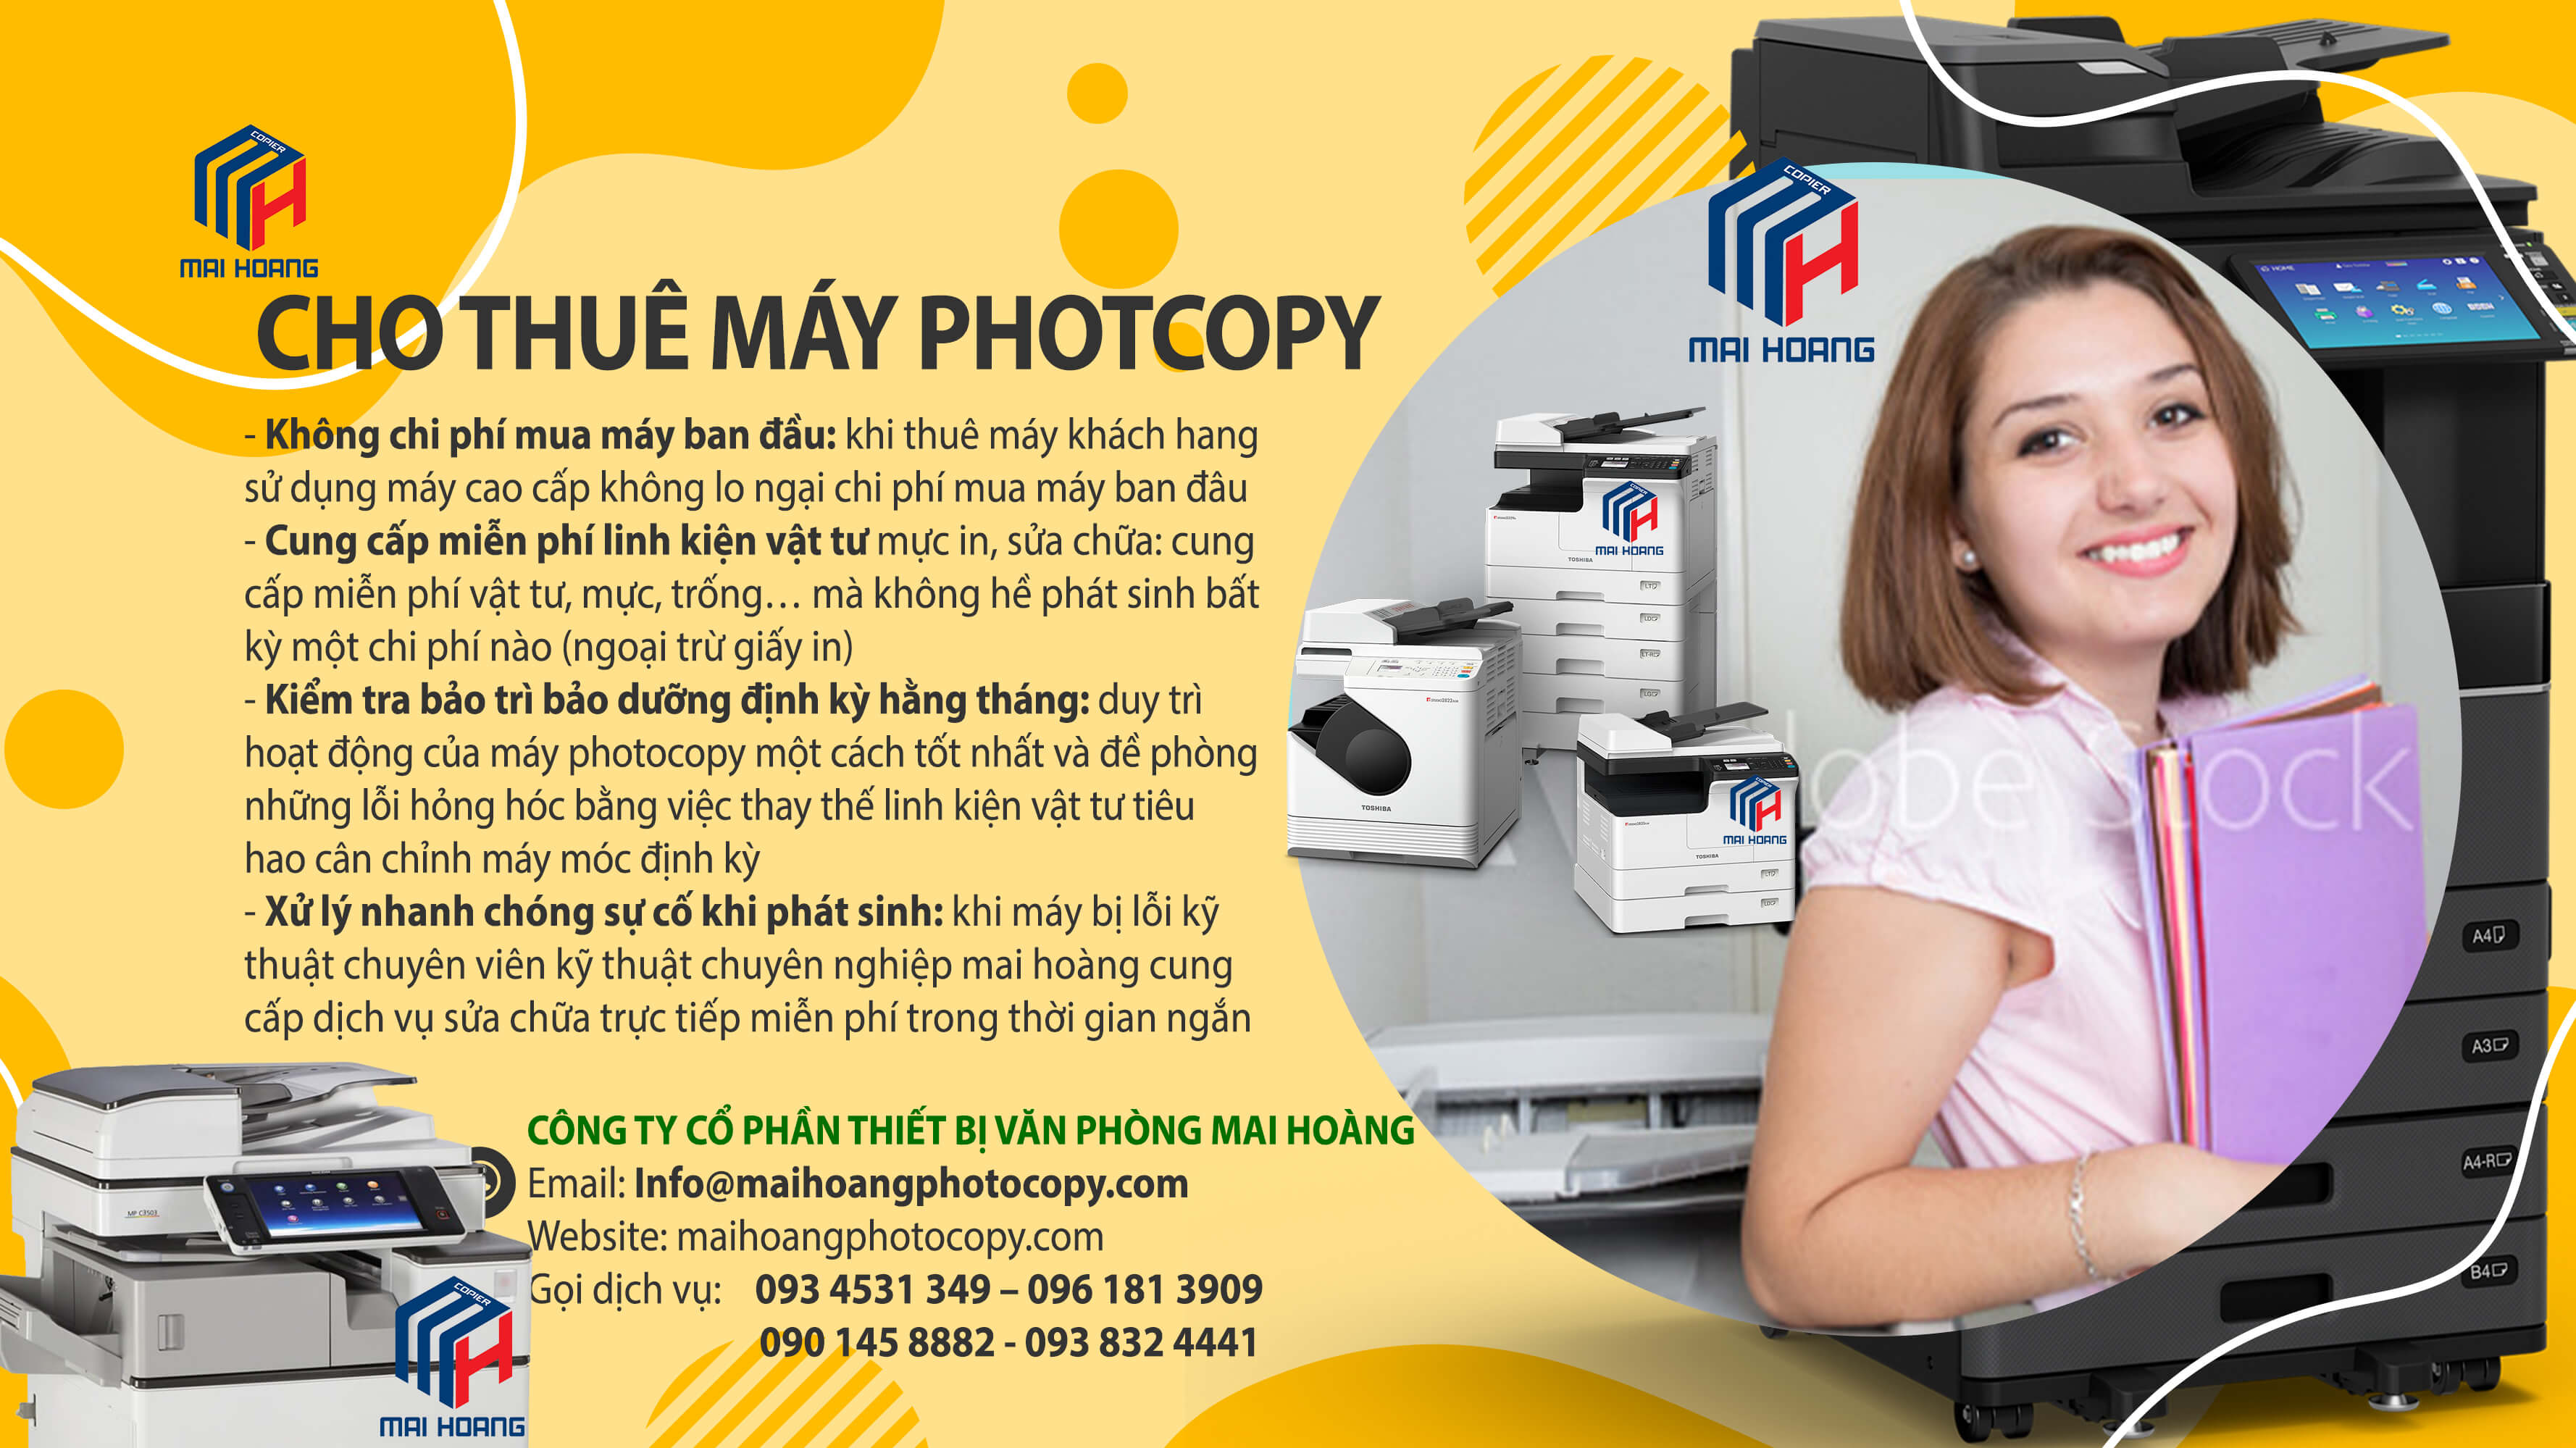 Cho Thuê Máy Photocopy Màu Đa Chức Năng Ricoh Aficio MP C6503